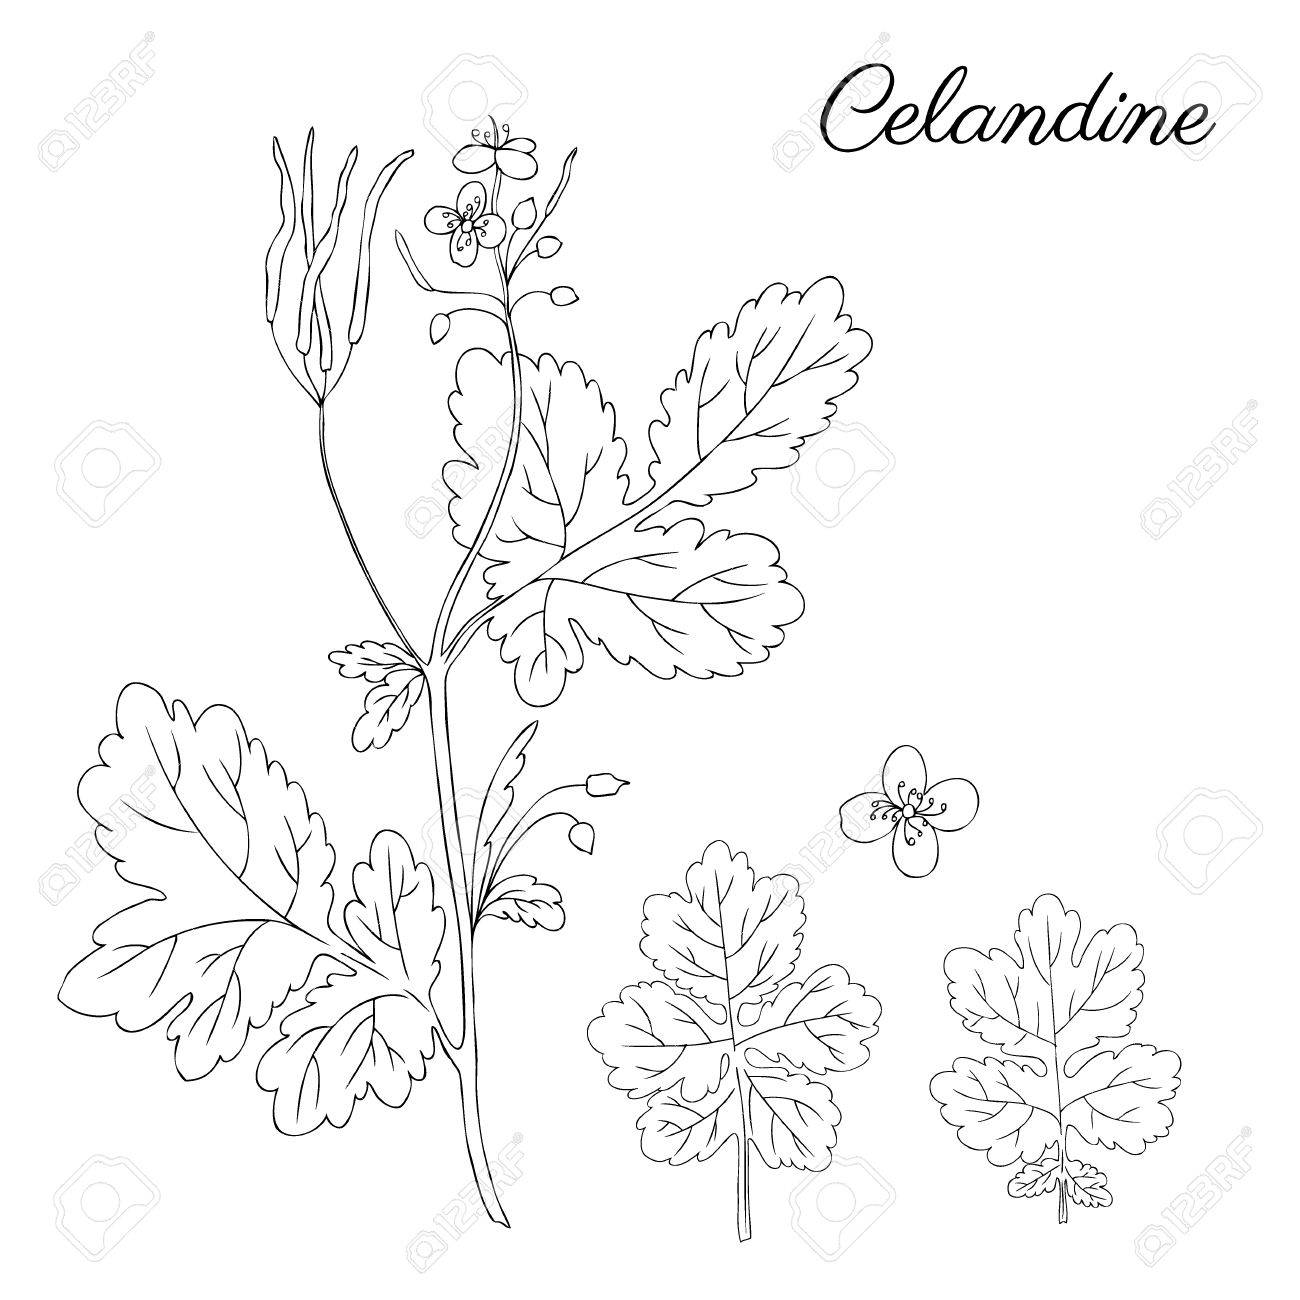 Celandine flower hand drawn graphic vector botanical illustration celandine flower hand drawn graphic vector botanical illustration doodle ink sketch isolated on white stopboris Images